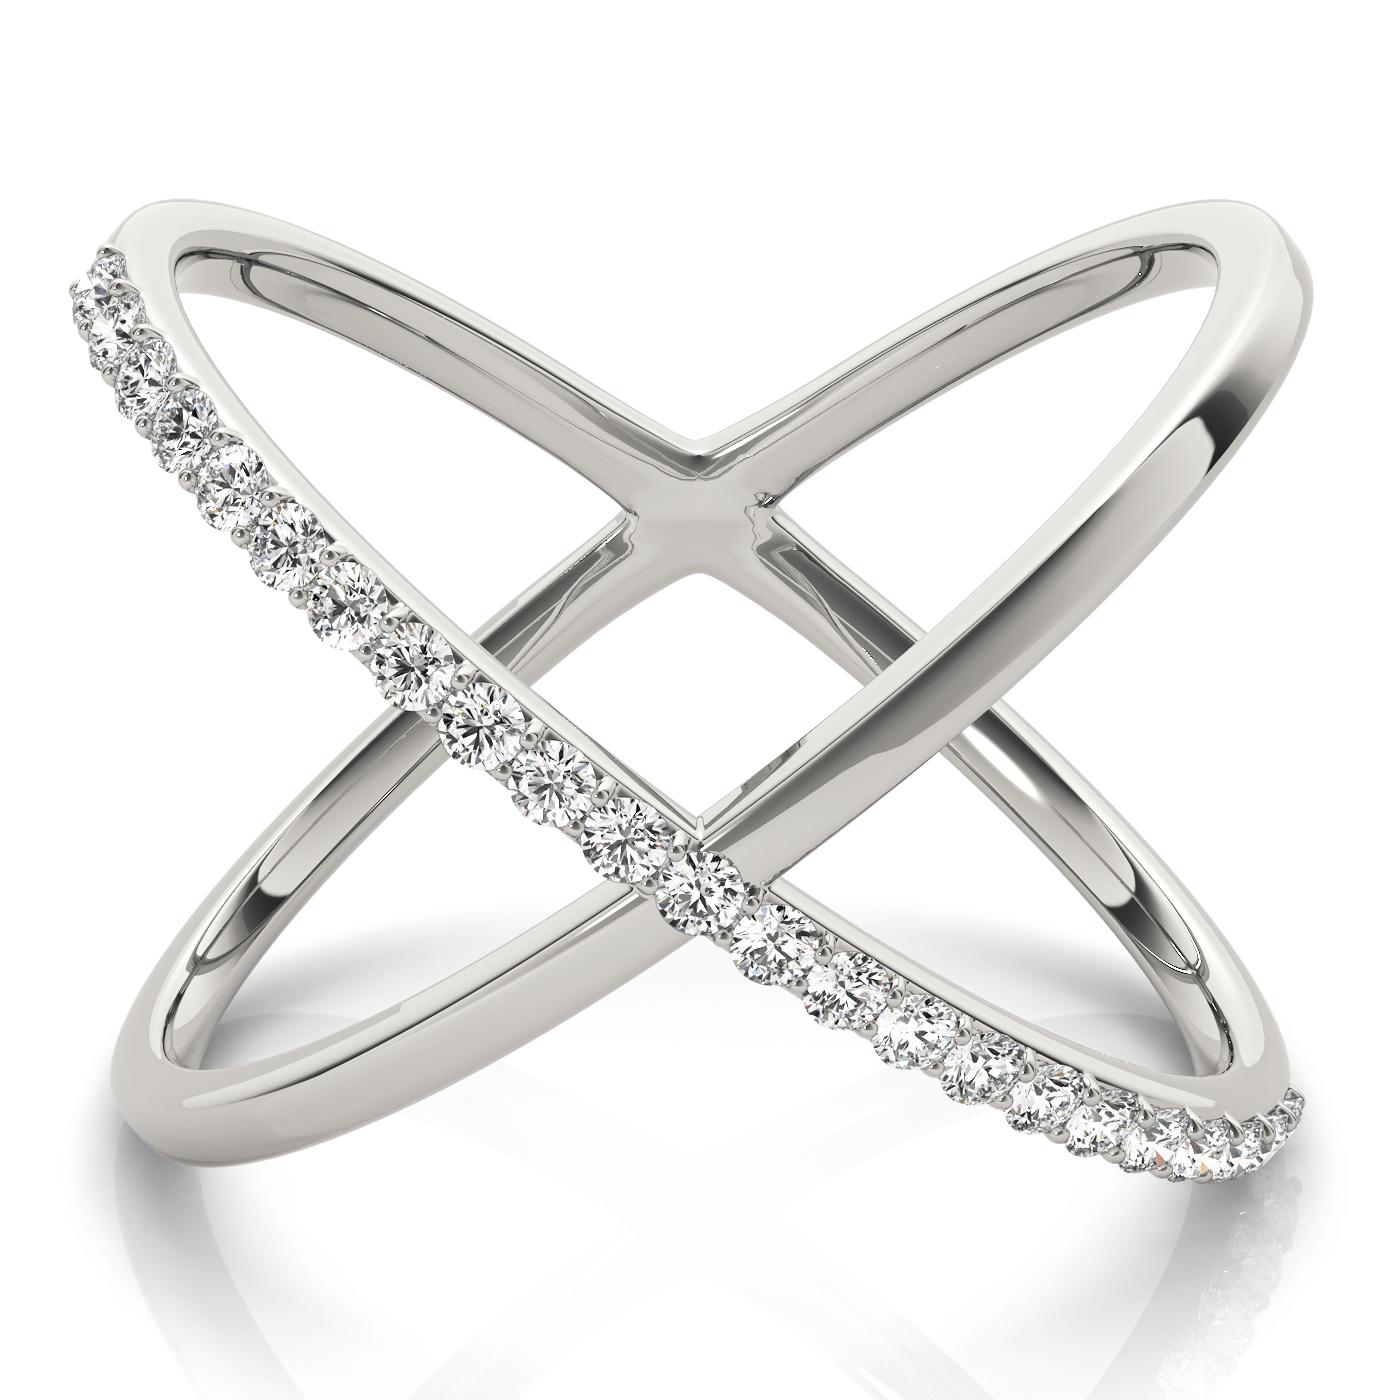 14k-white-gold-open-concept-diamond-engagement-ring-84802_ring